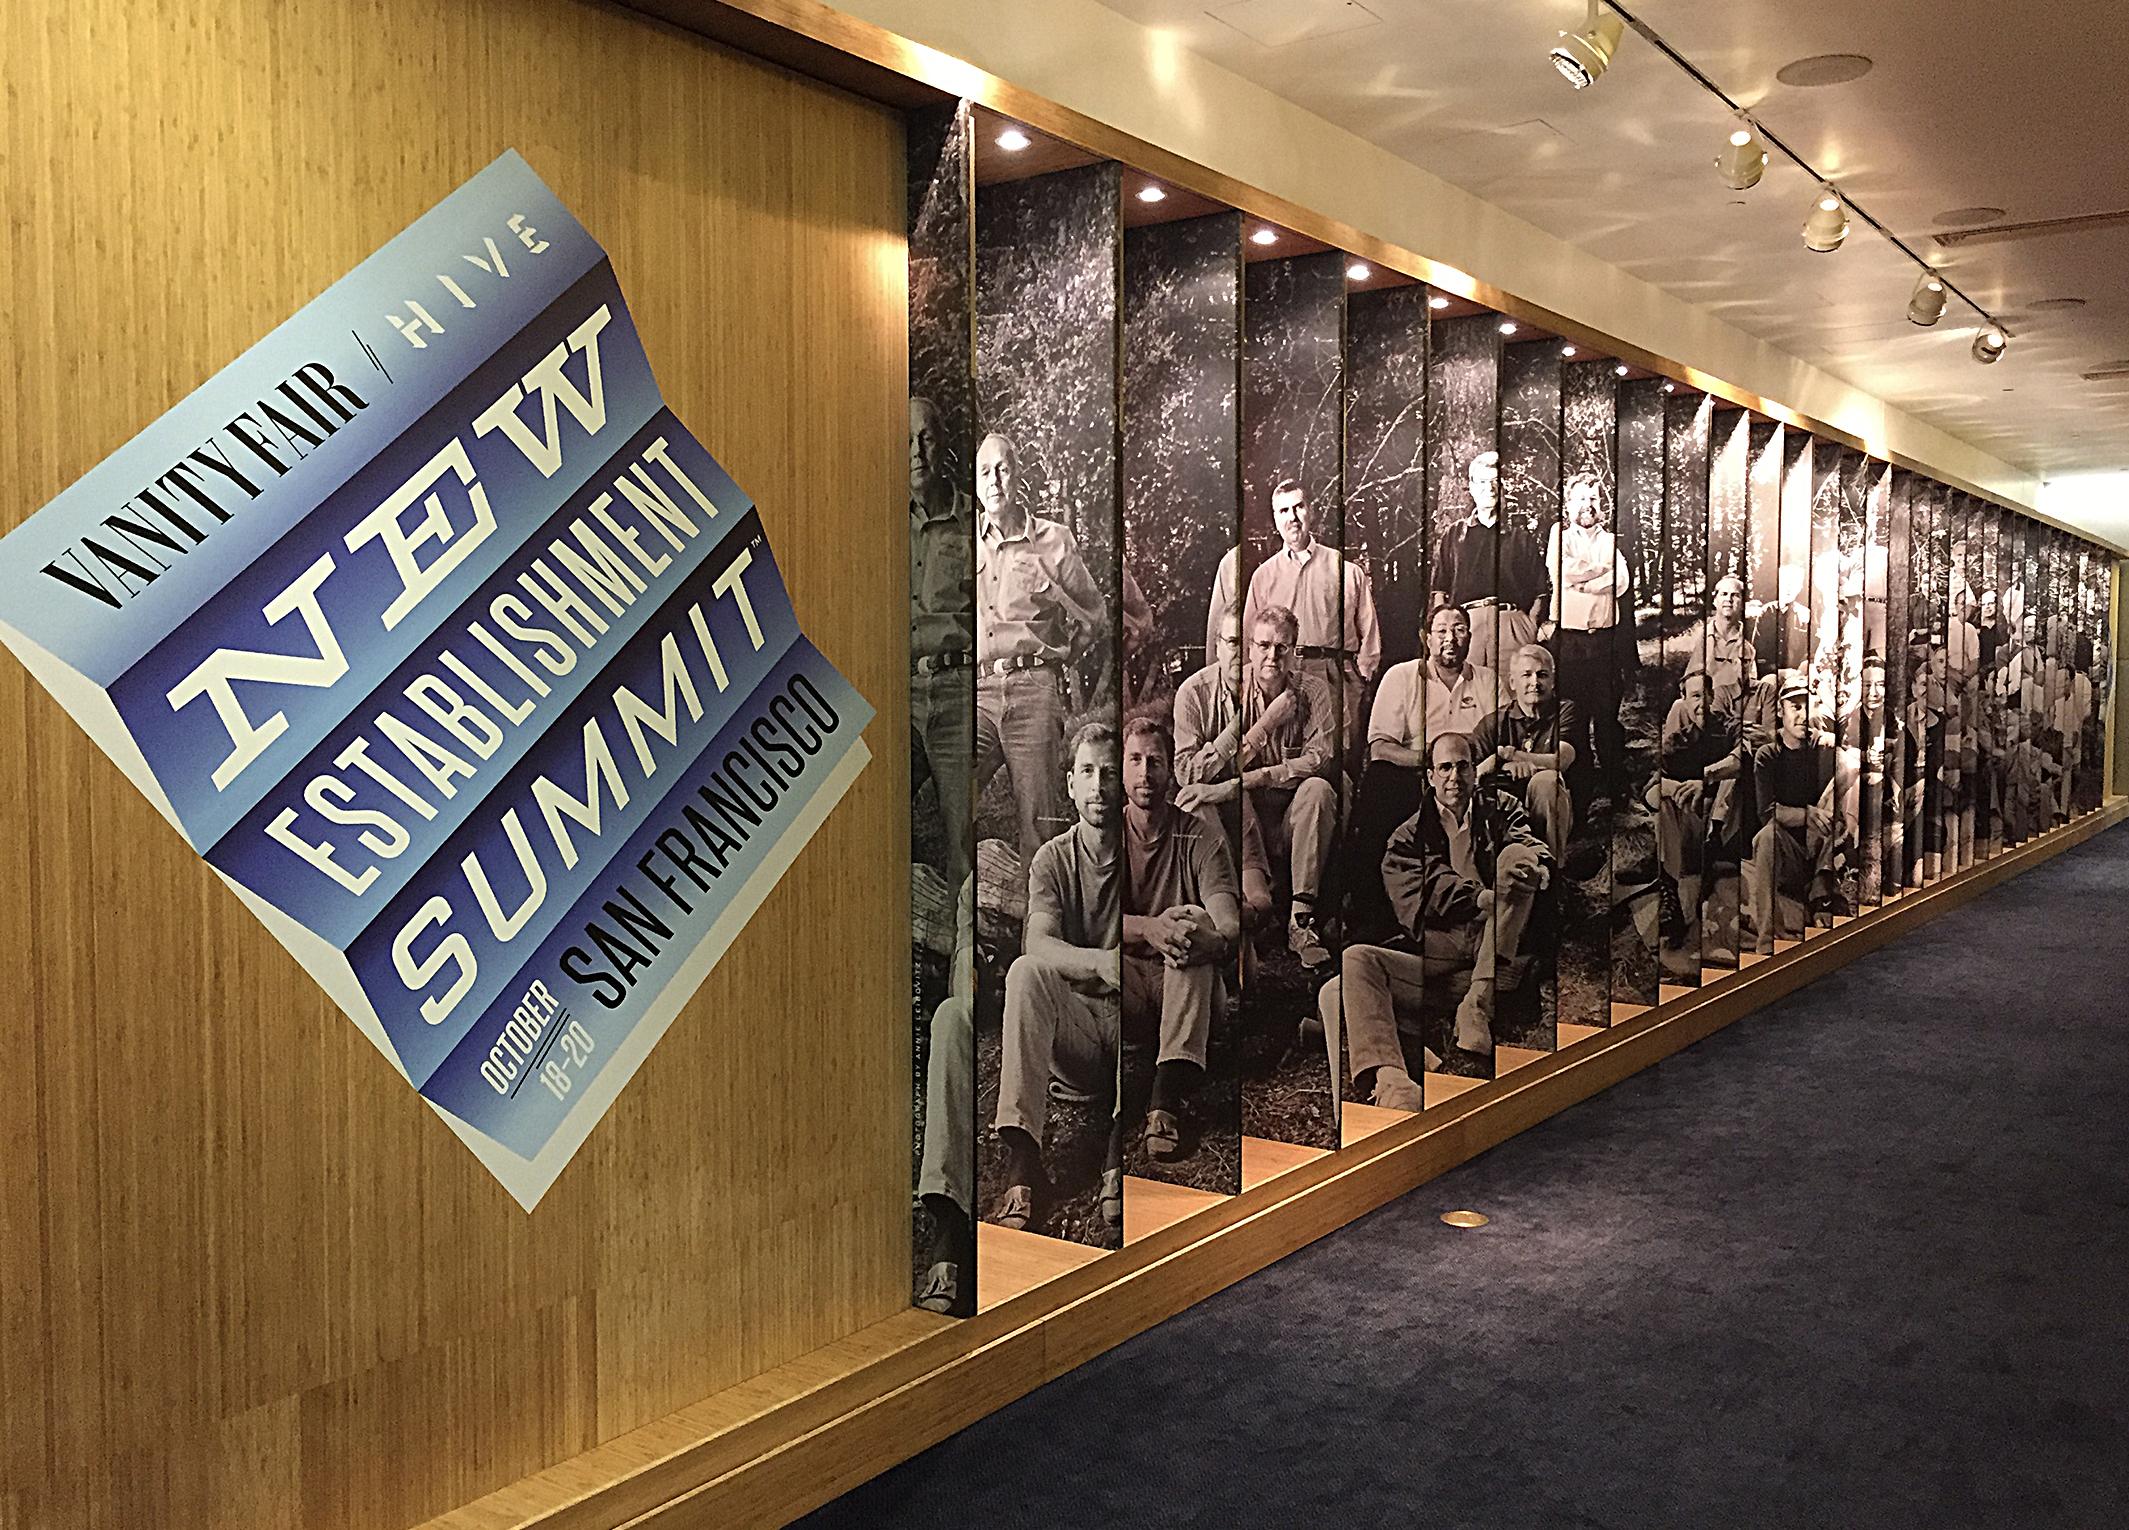 vf summit 2016-5.jpg